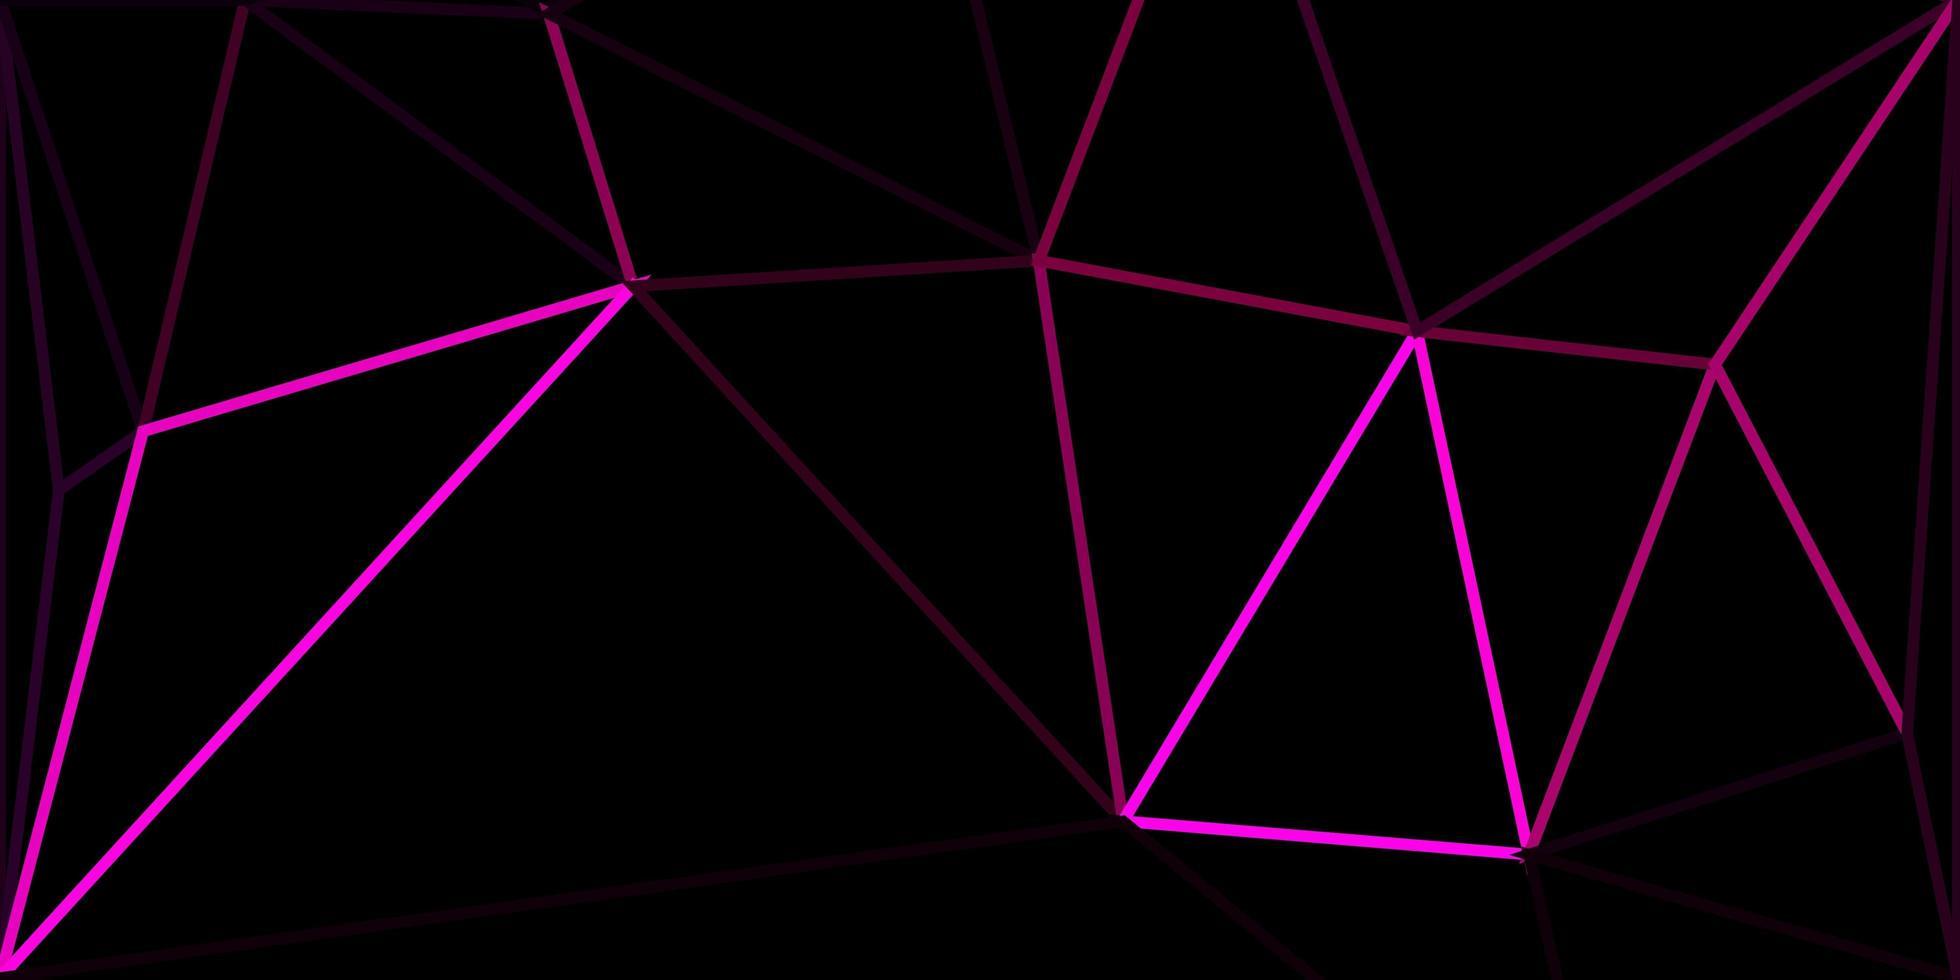 dunkelrosa Polydreieck Textur vektor